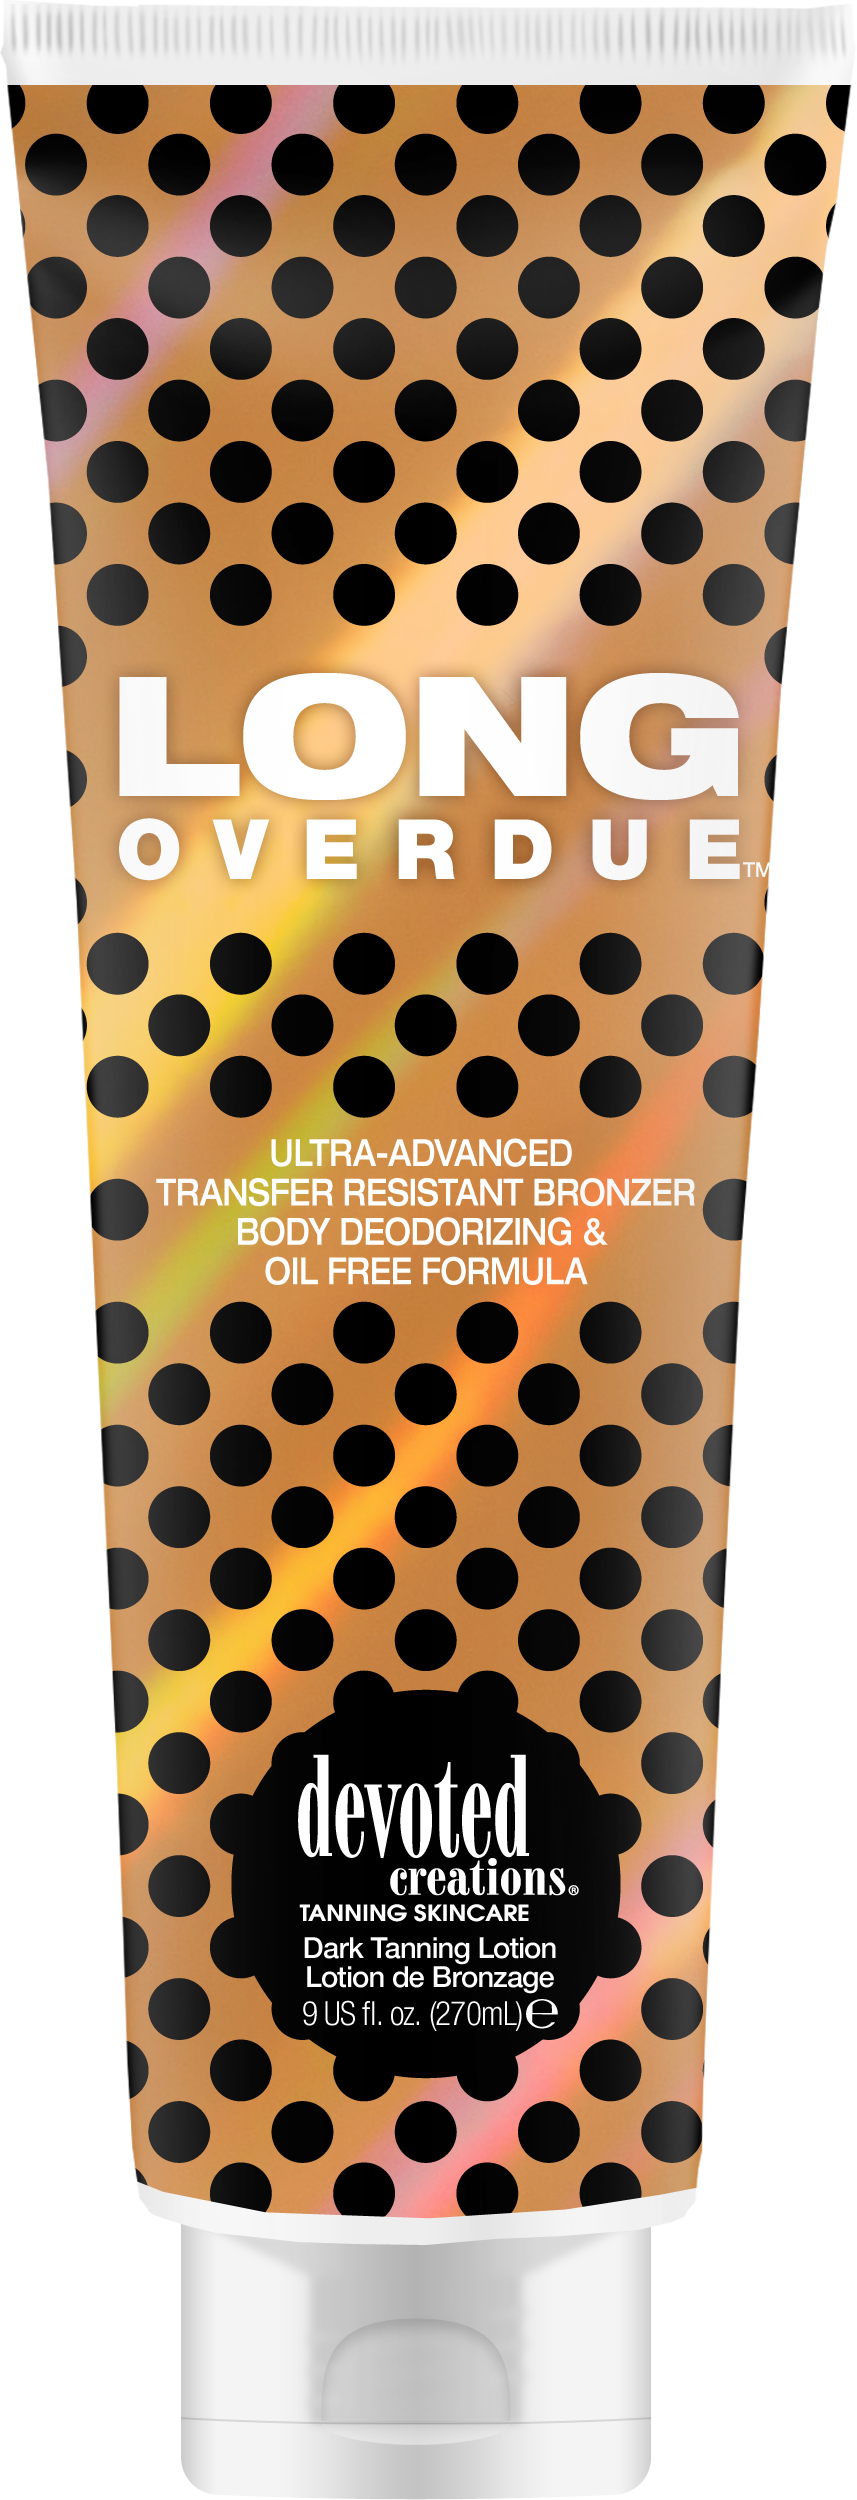 Long Overdue™